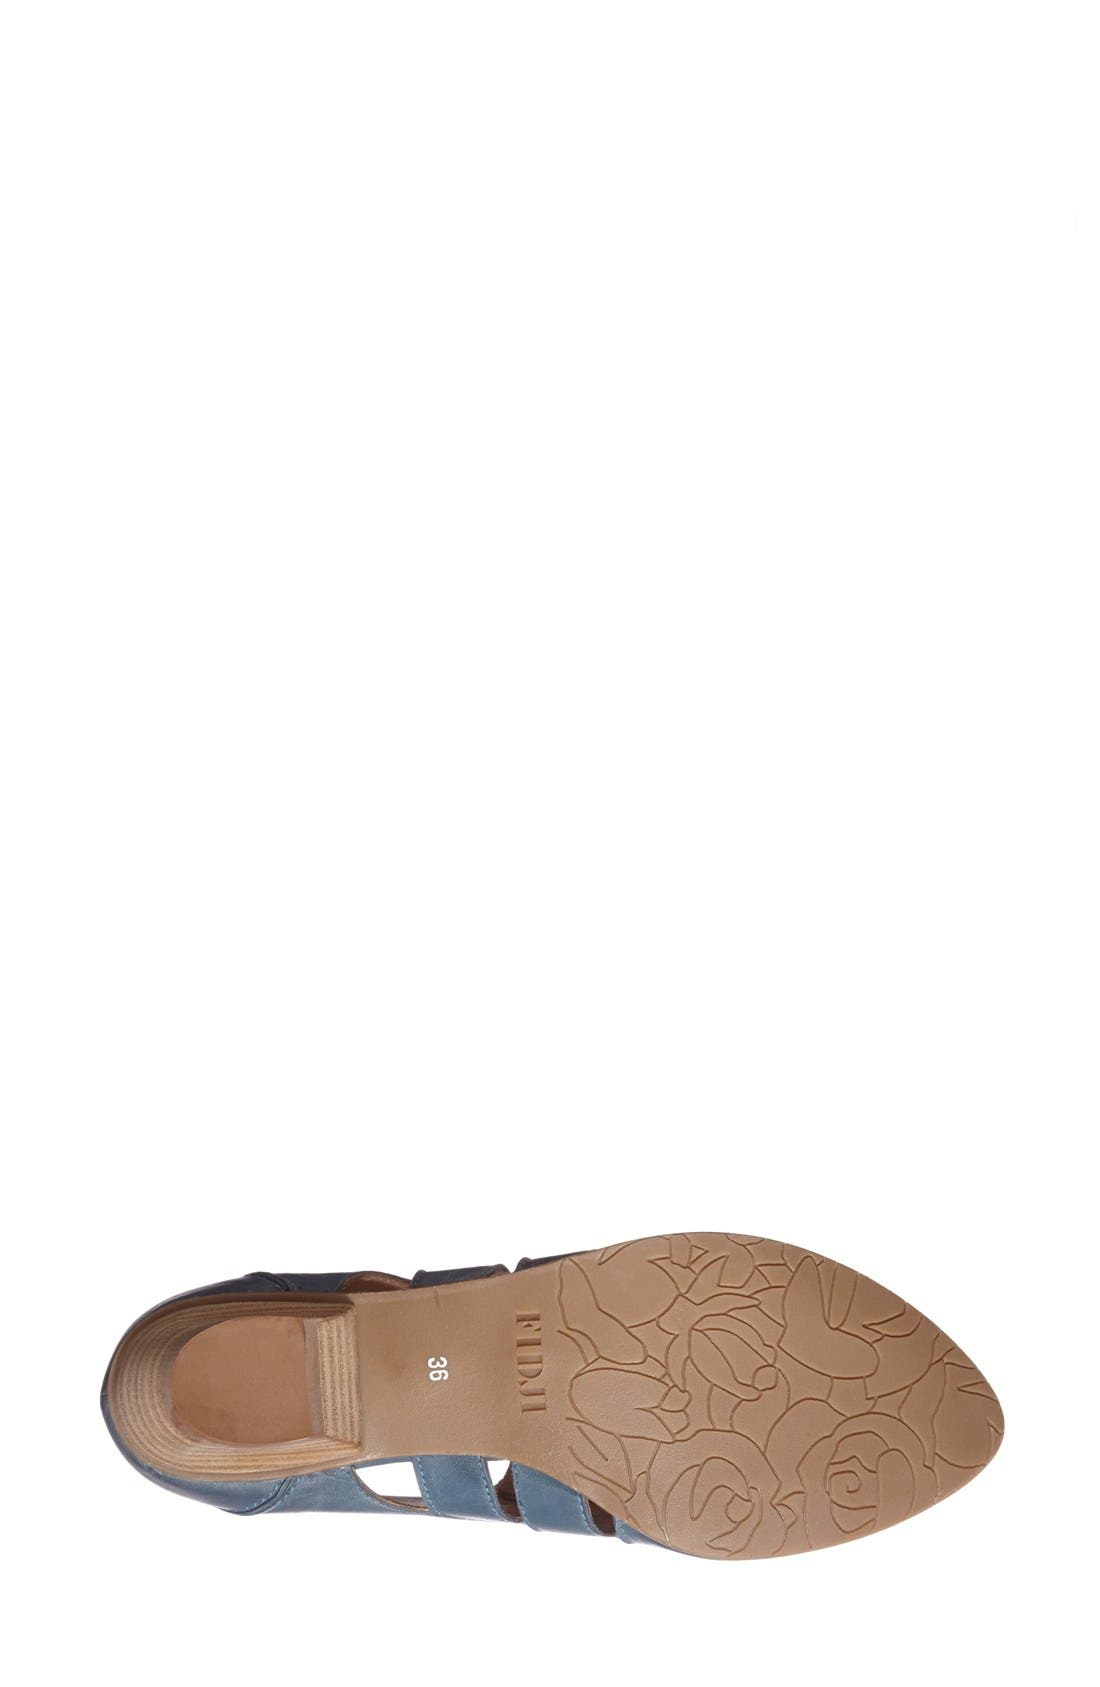 Alternate Image 4  - Fidji 'VO92' Perforated Leather Pump (Women)